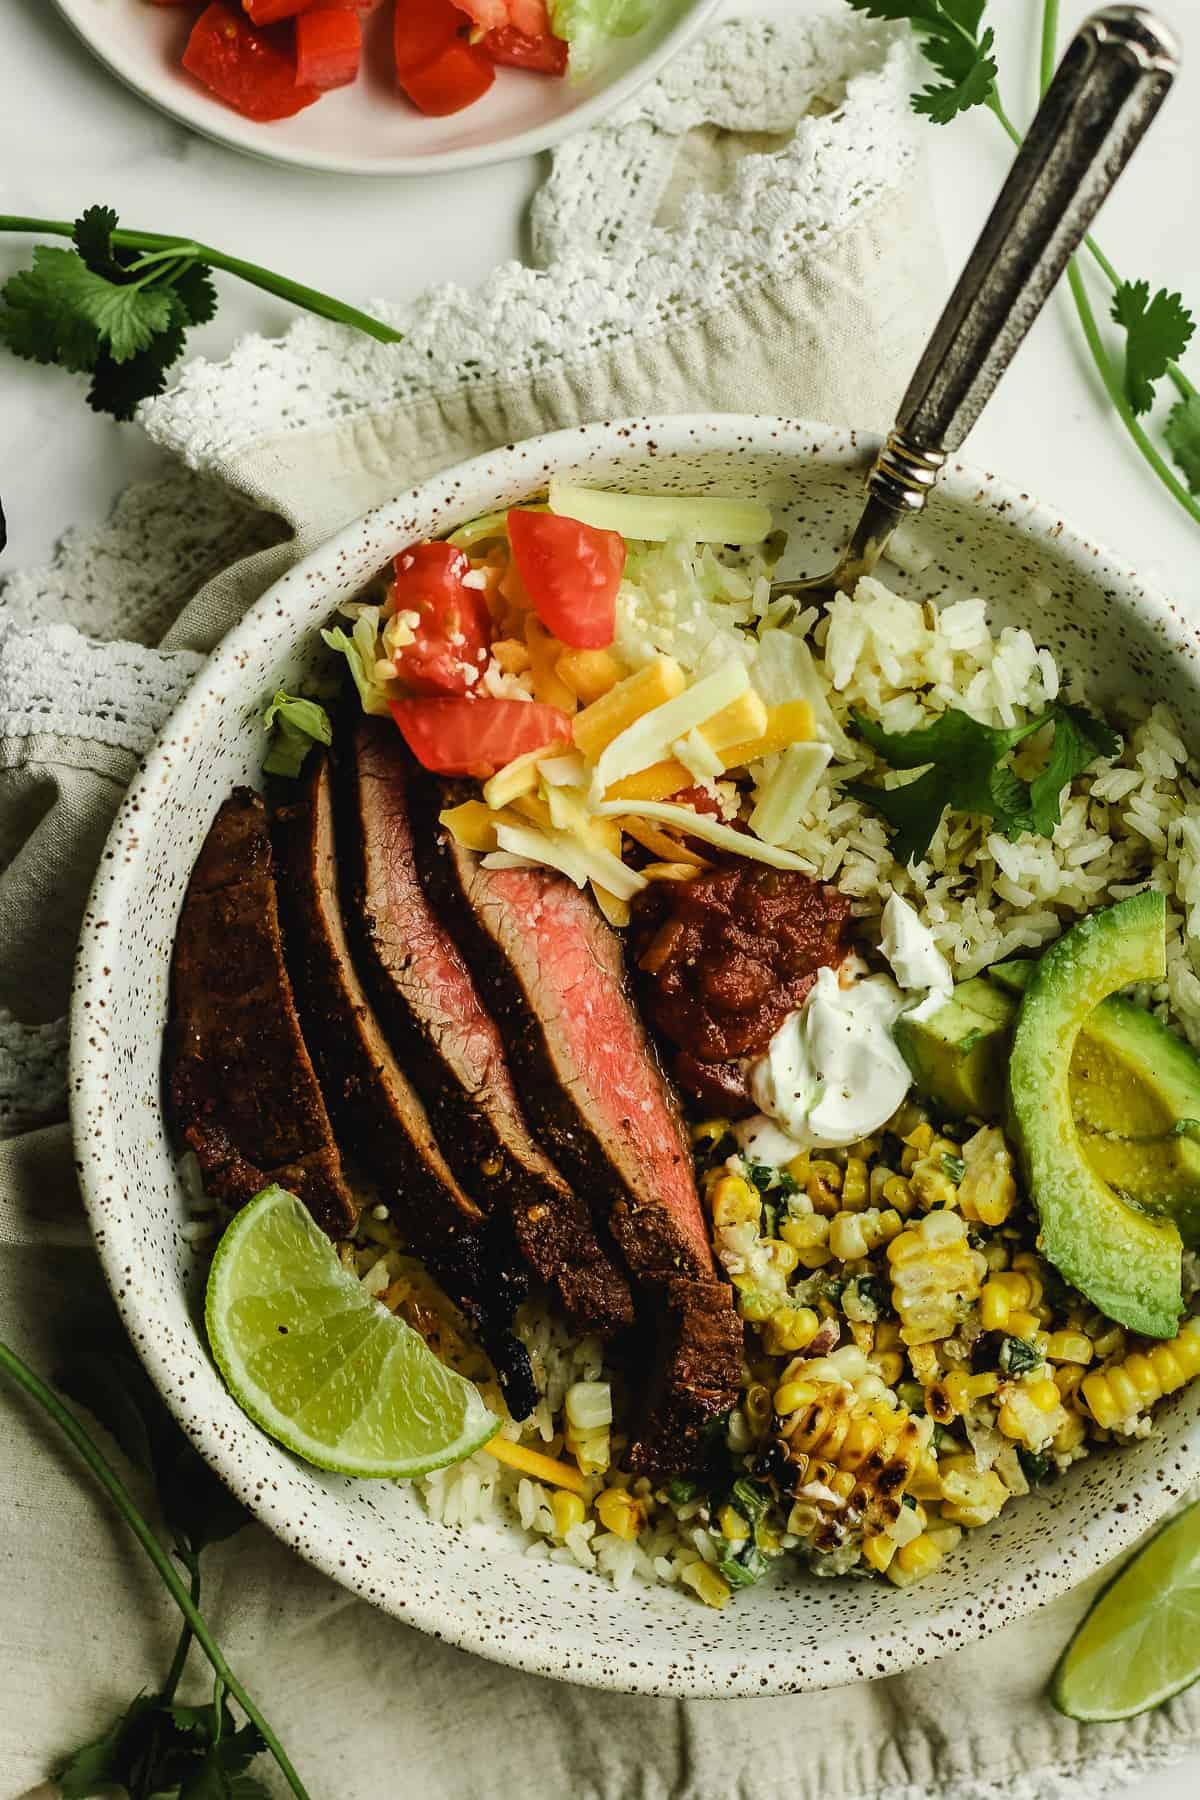 Closeup shot of carne asada burrito bowls with Mexican Street Corn.